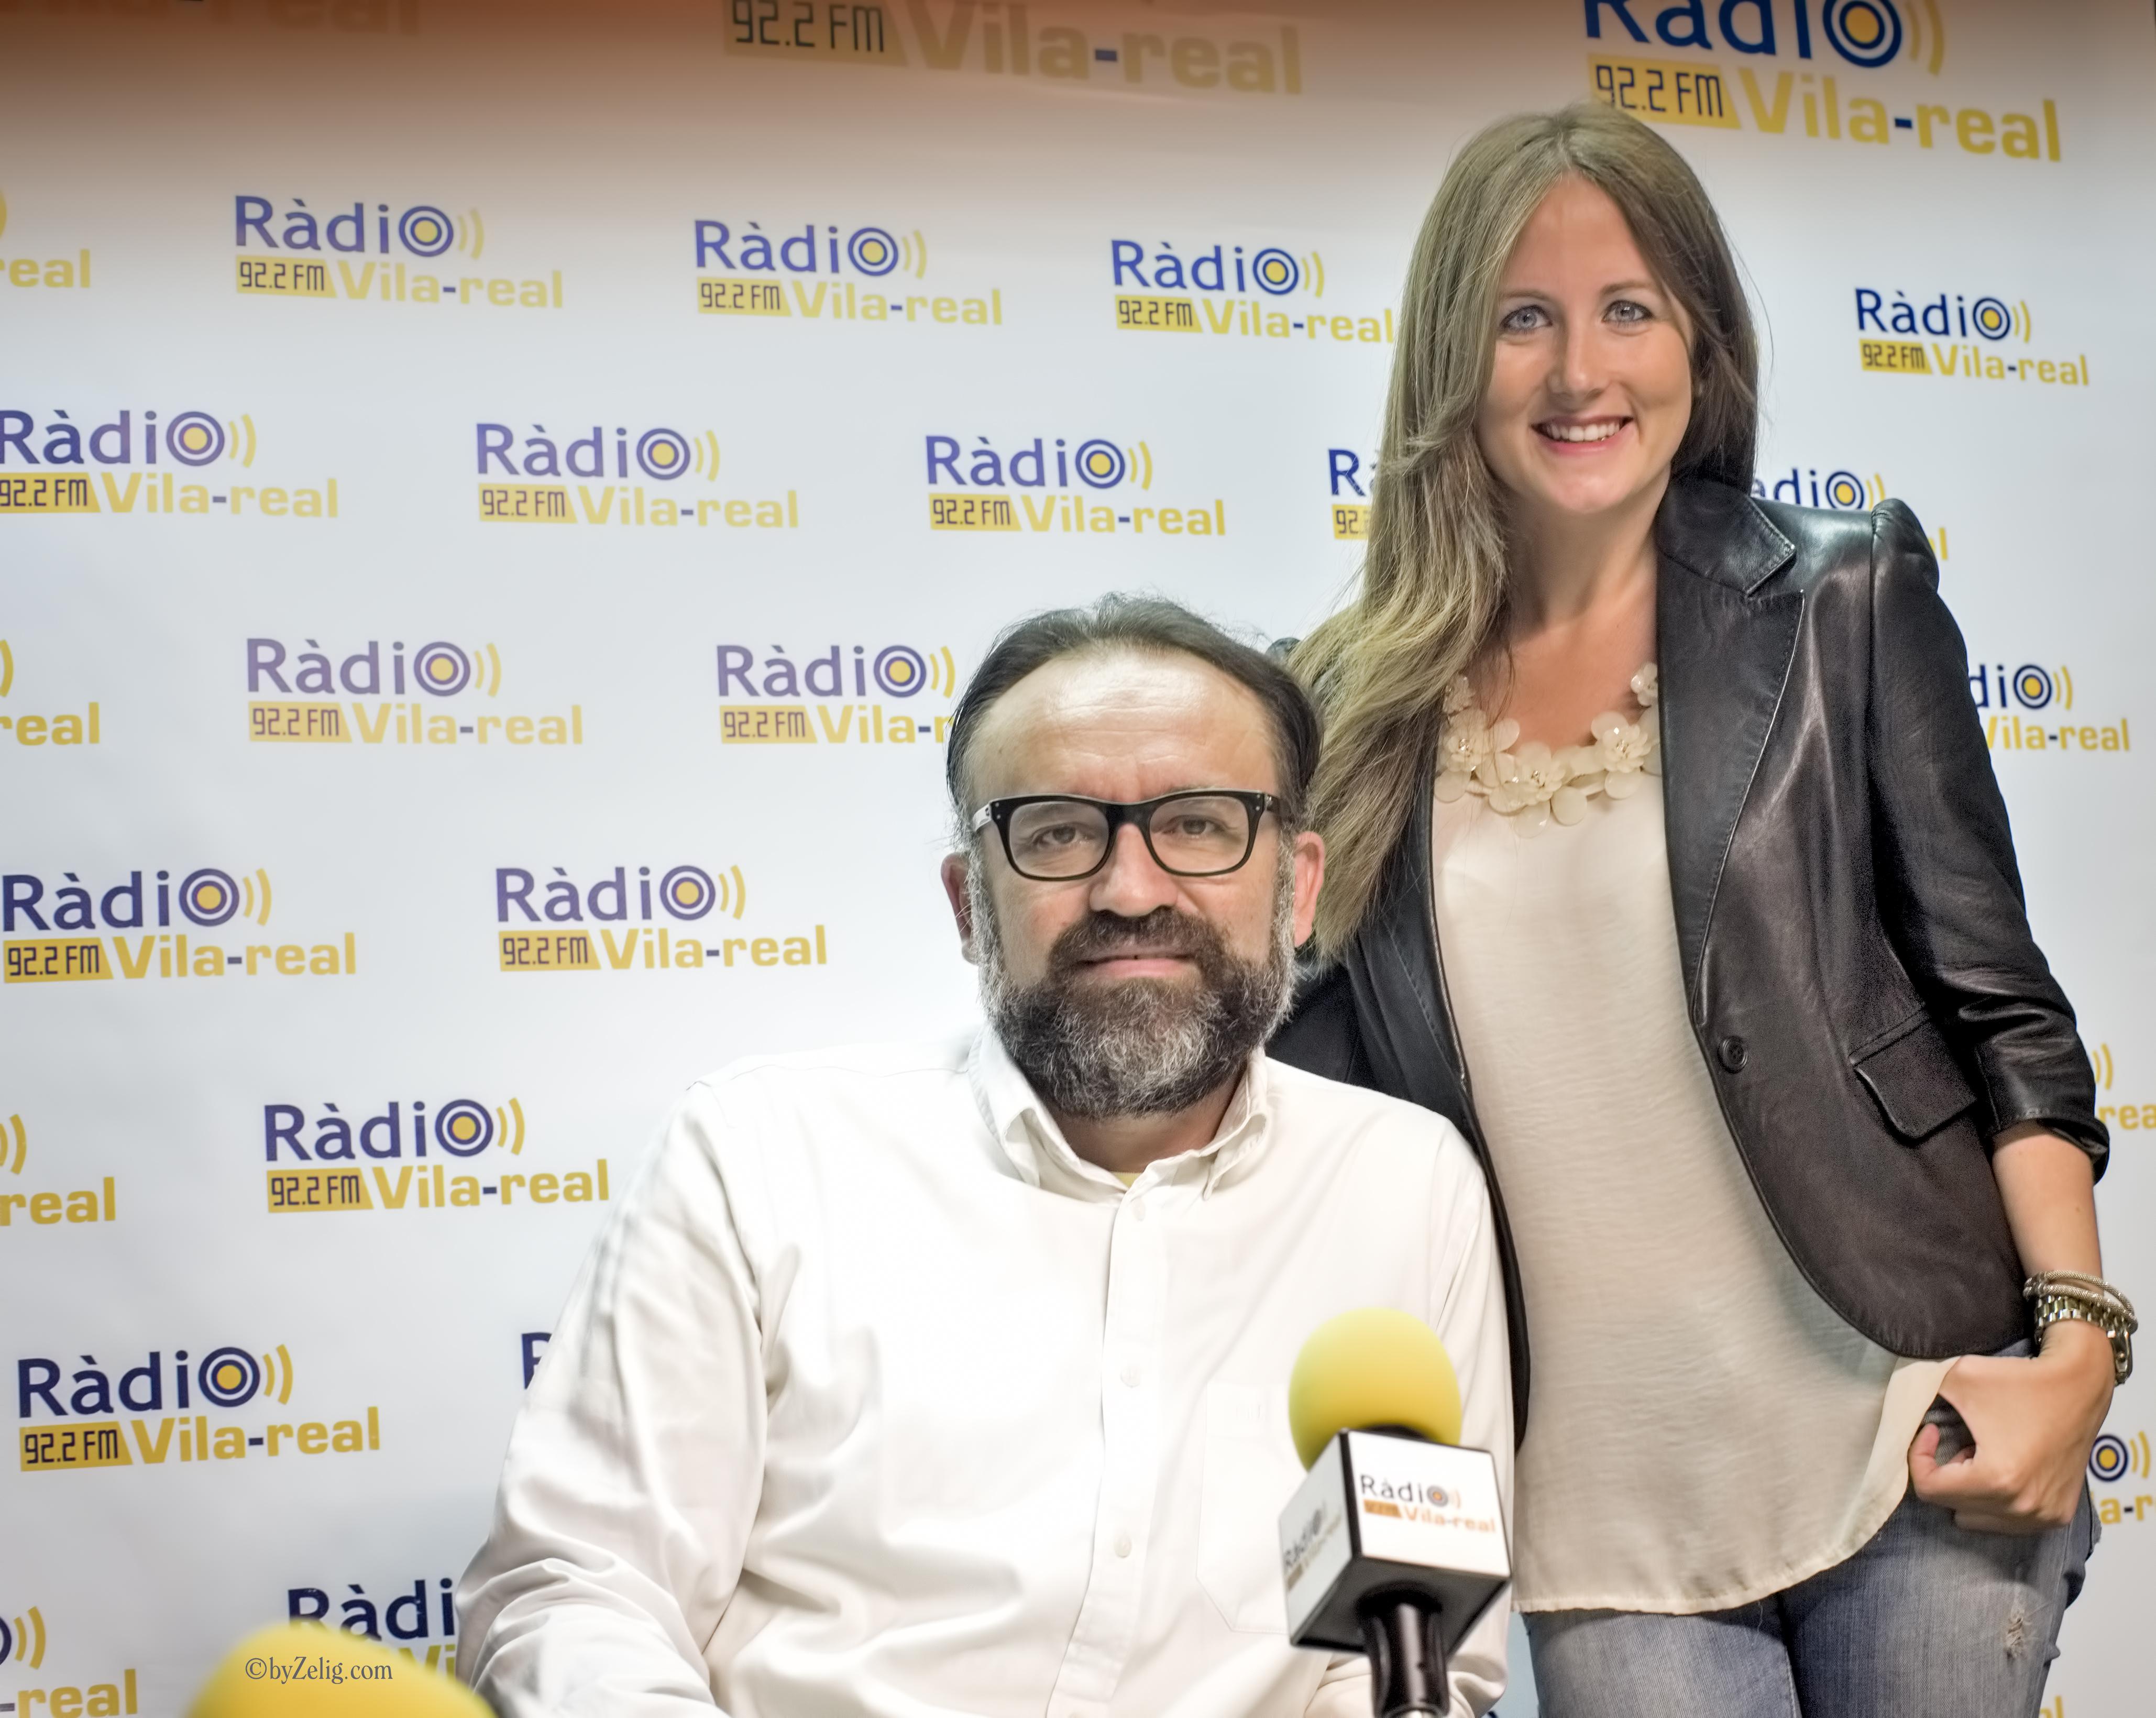 Esports Radio Vila-real. Programa del 2 de octubre 2017